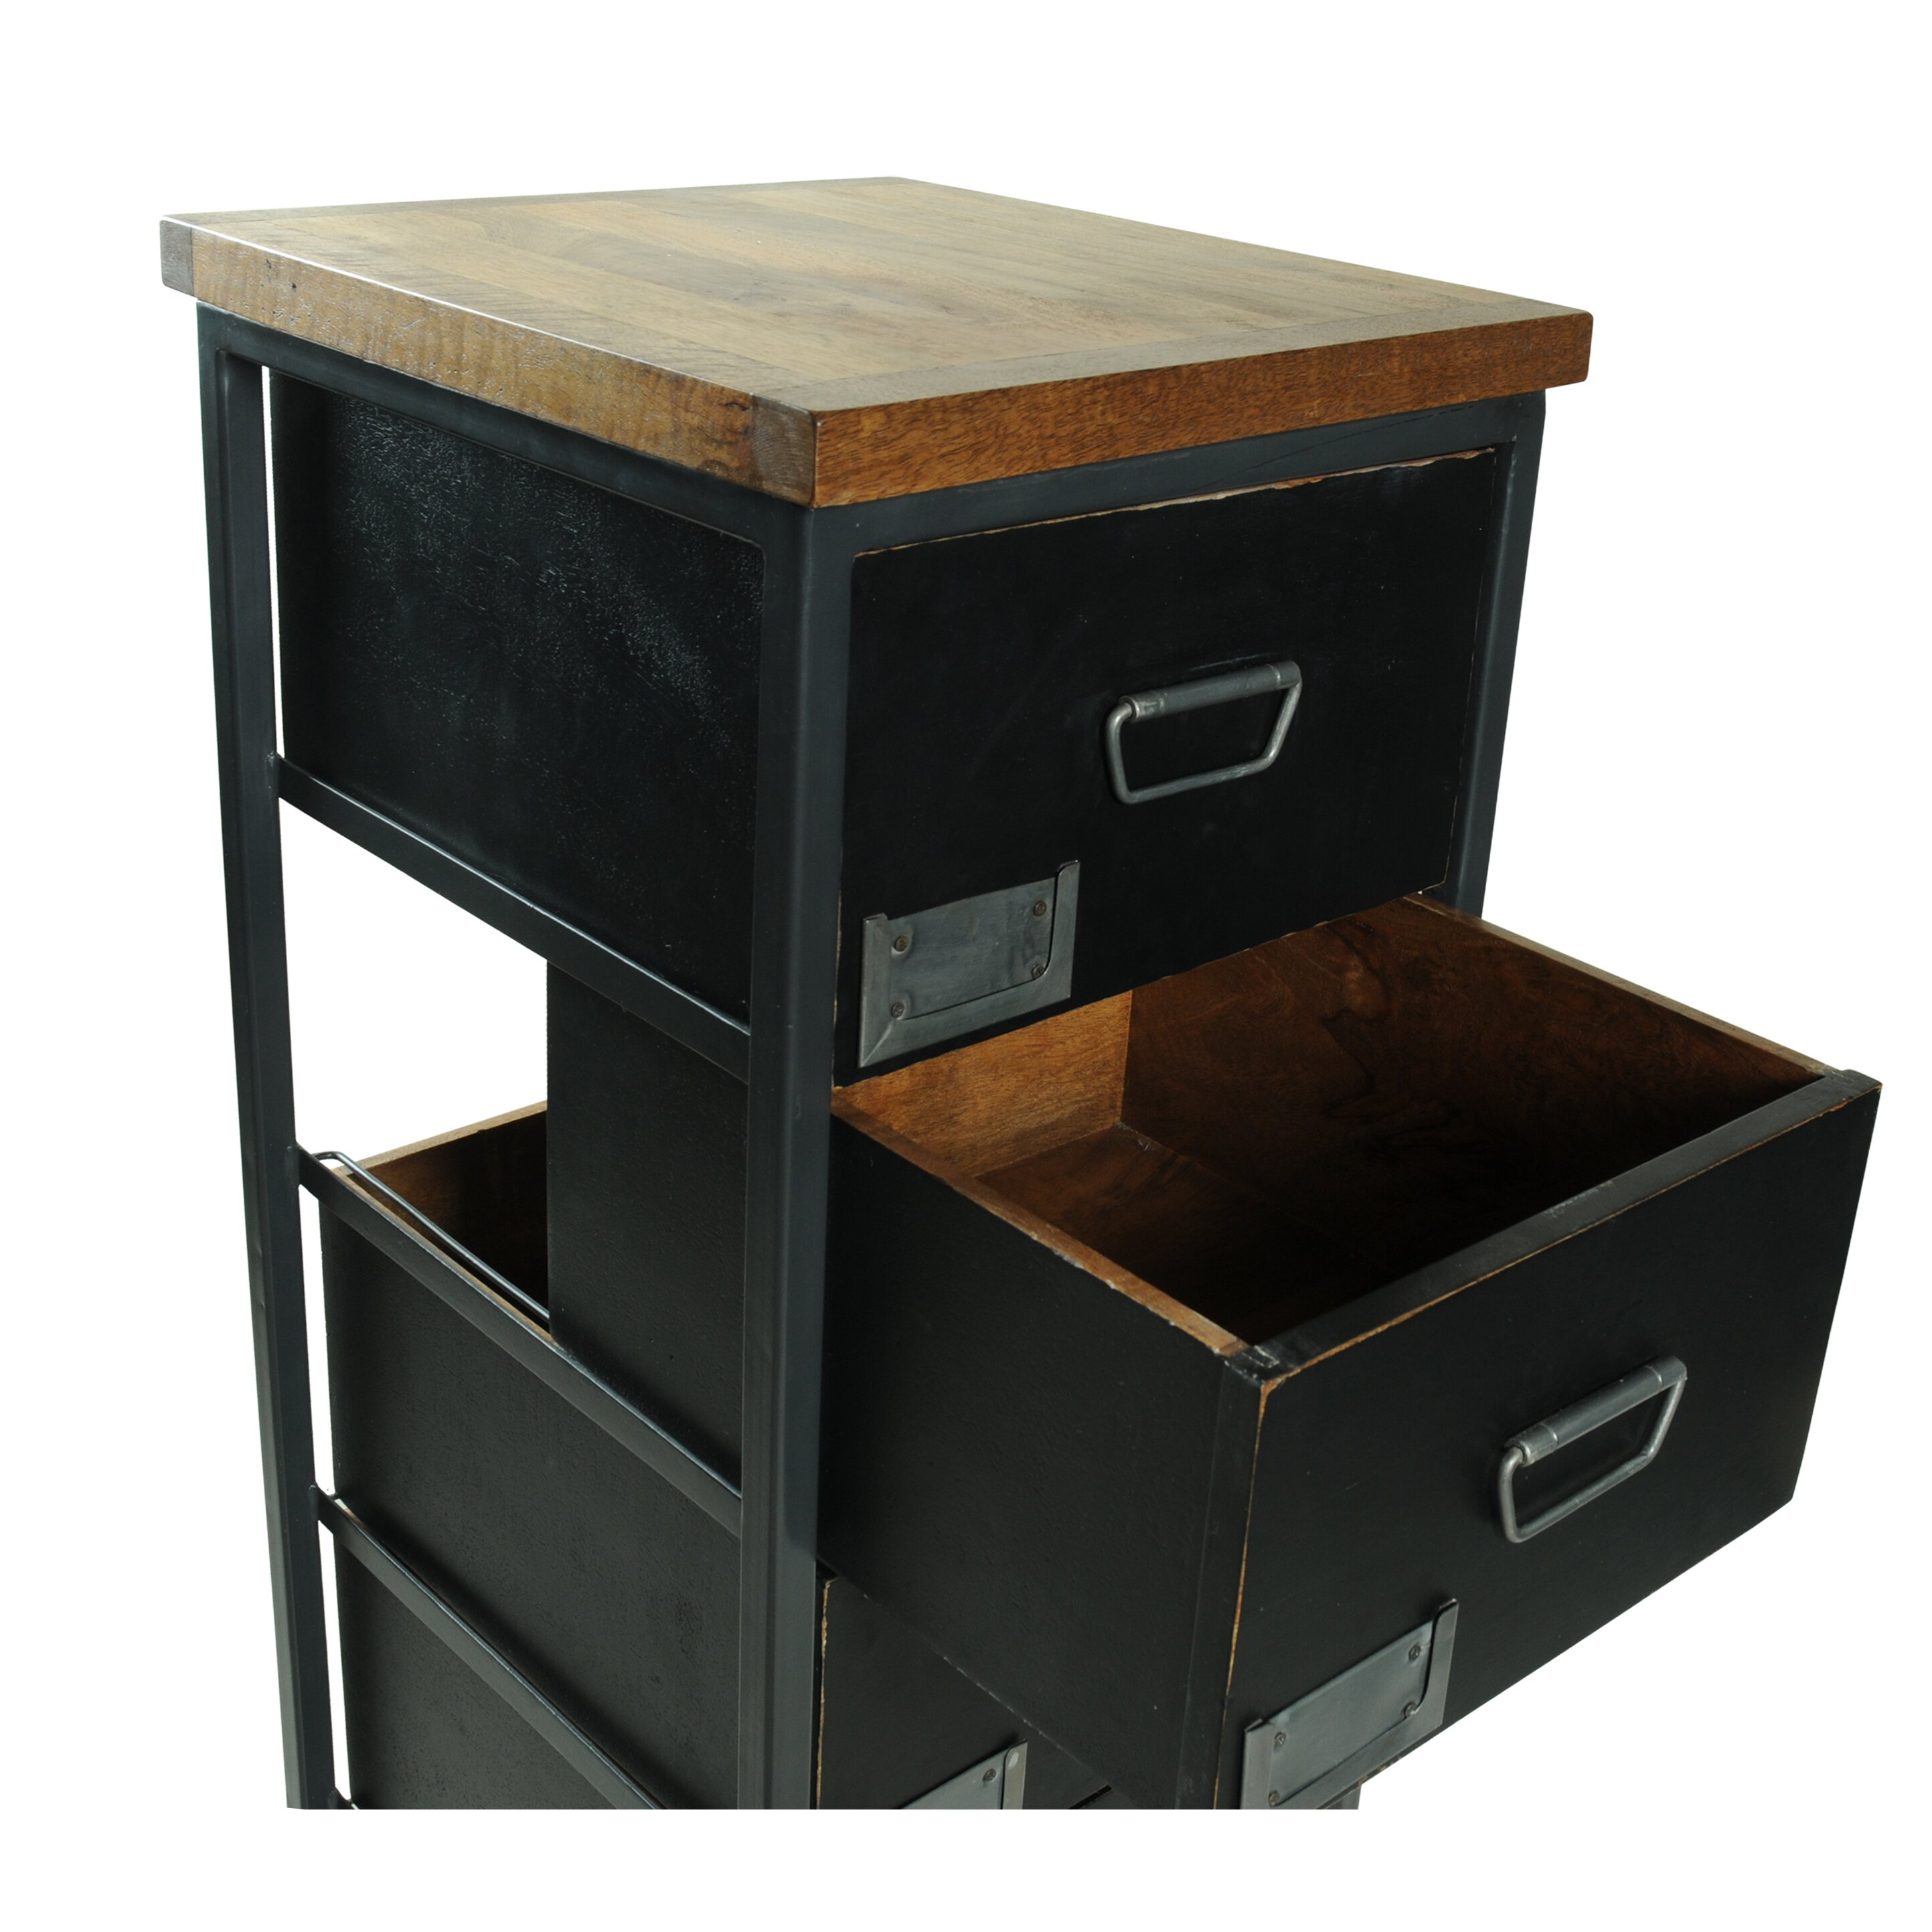 Homestead living 6 drawer chest of drawers wayfair uk for Divan 2 2 drawers